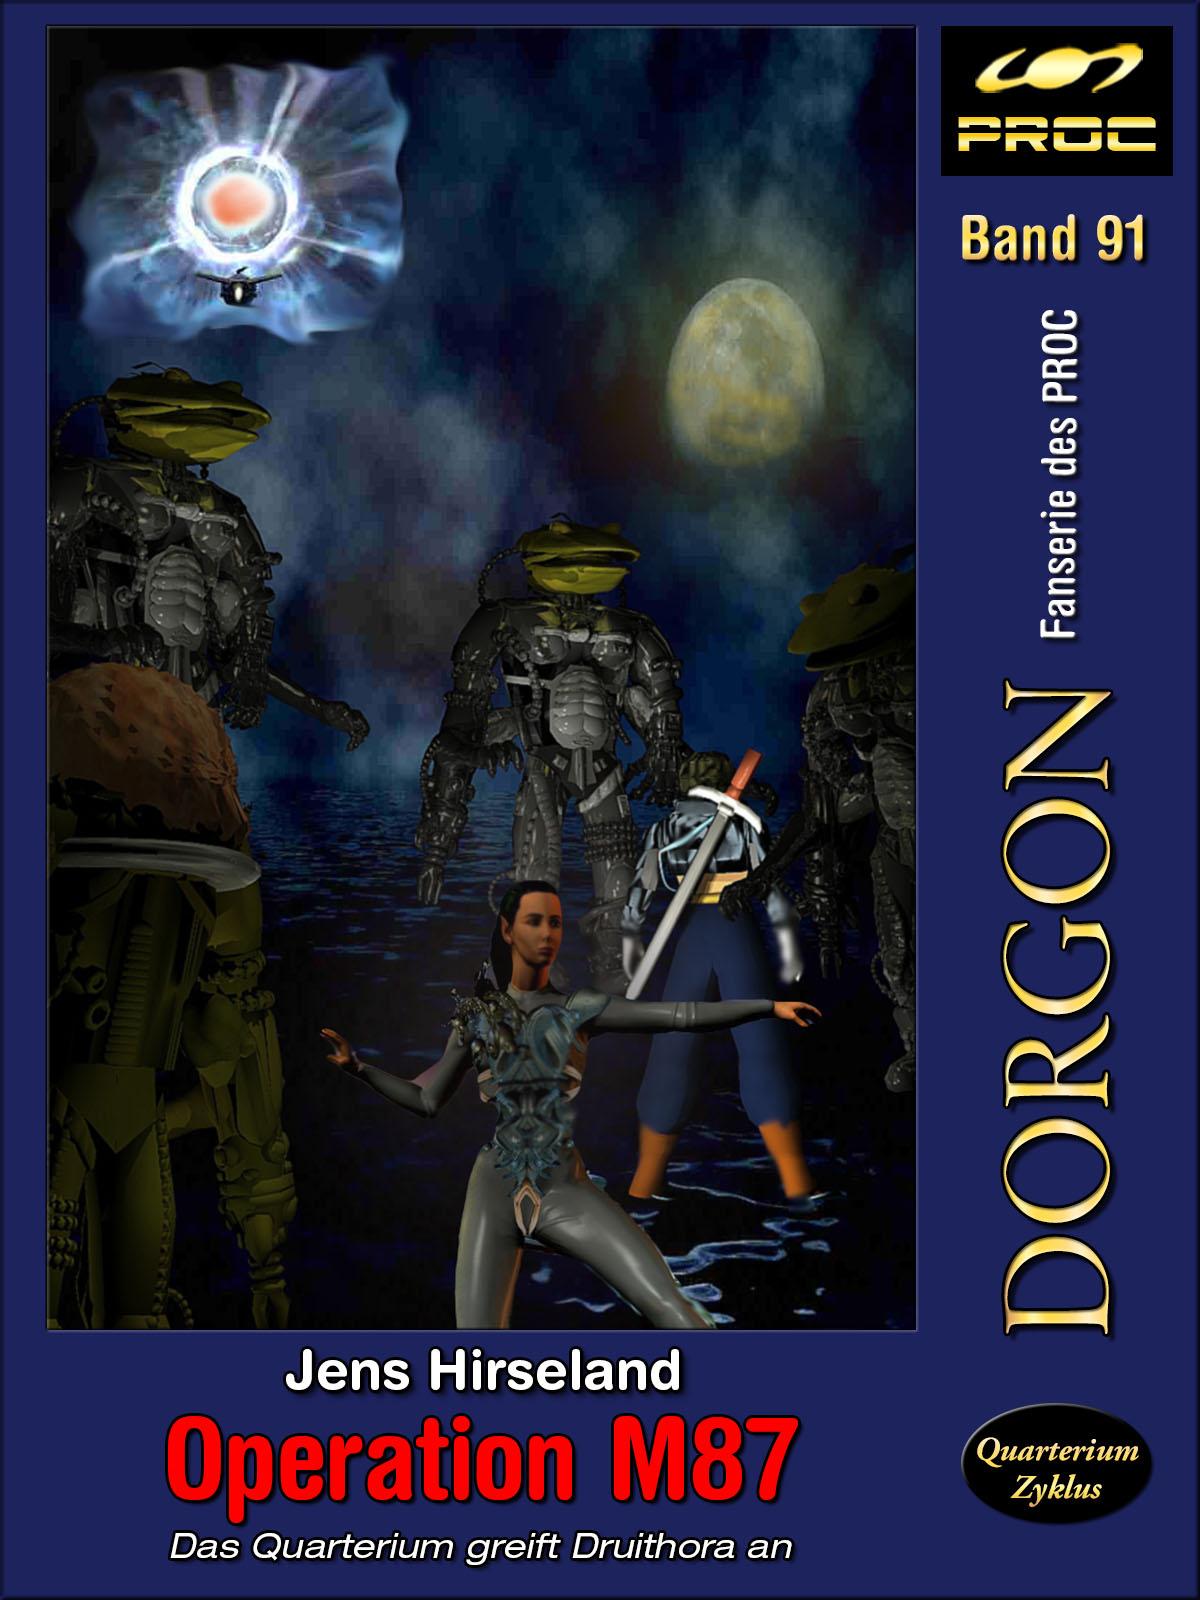 DORGON Cover Band 91